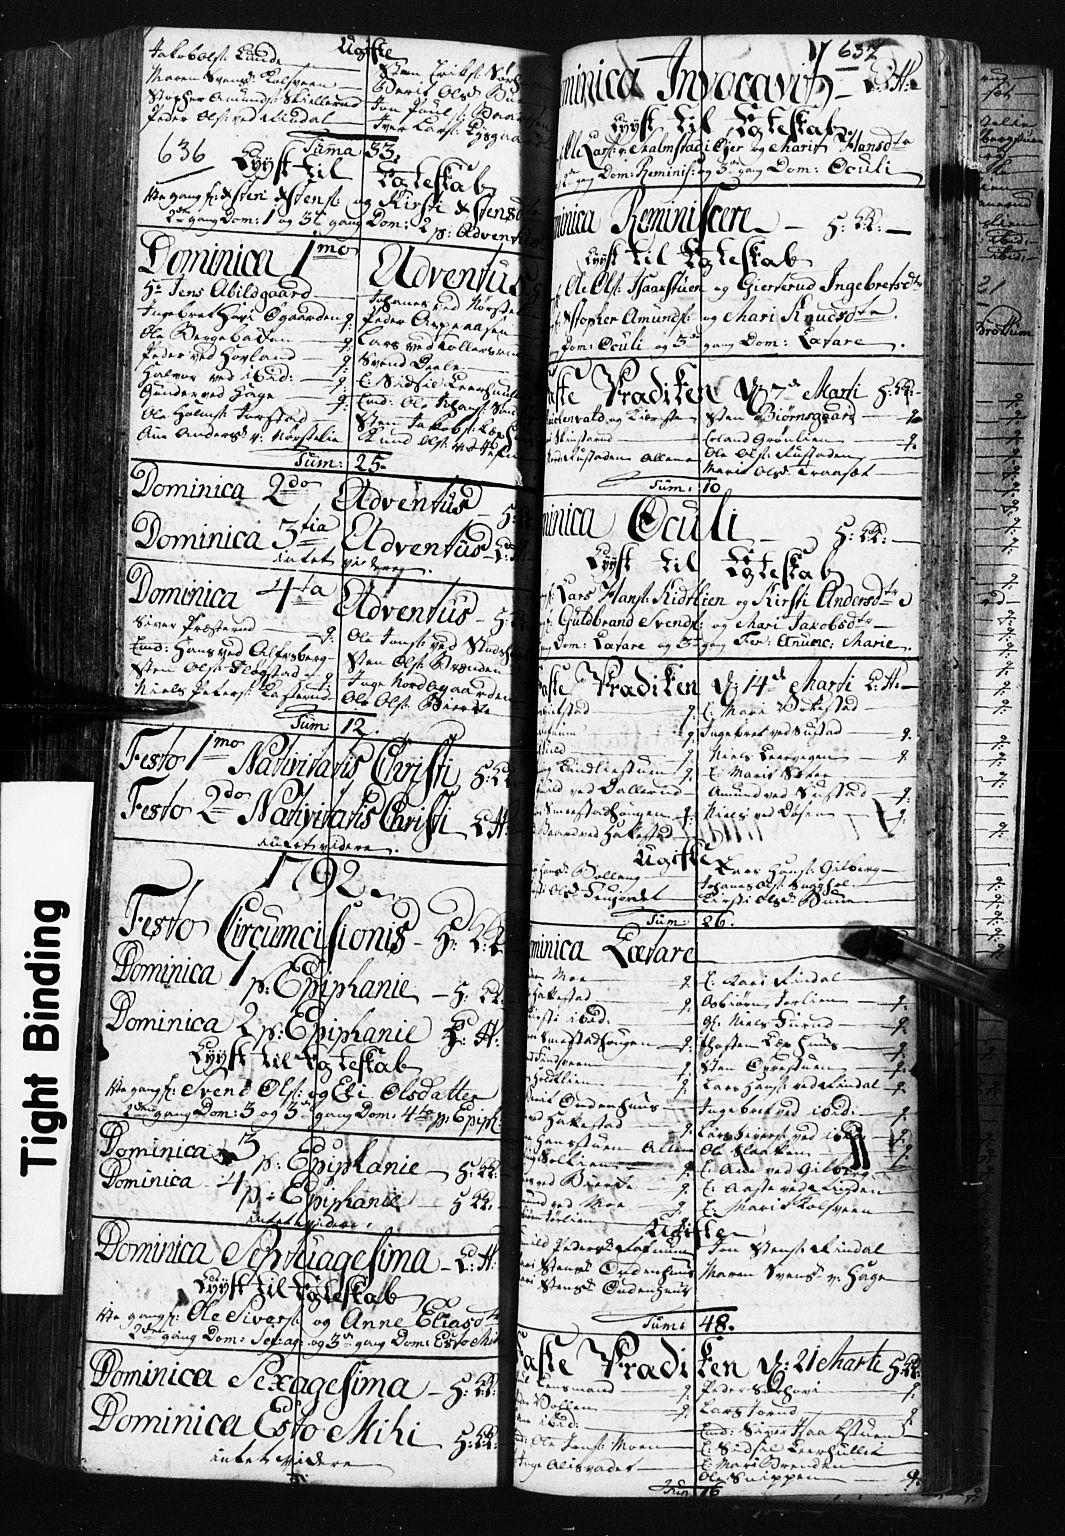 SAH, Fåberg prestekontor, Klokkerbok nr. 3, 1768-1796, s. 636-637